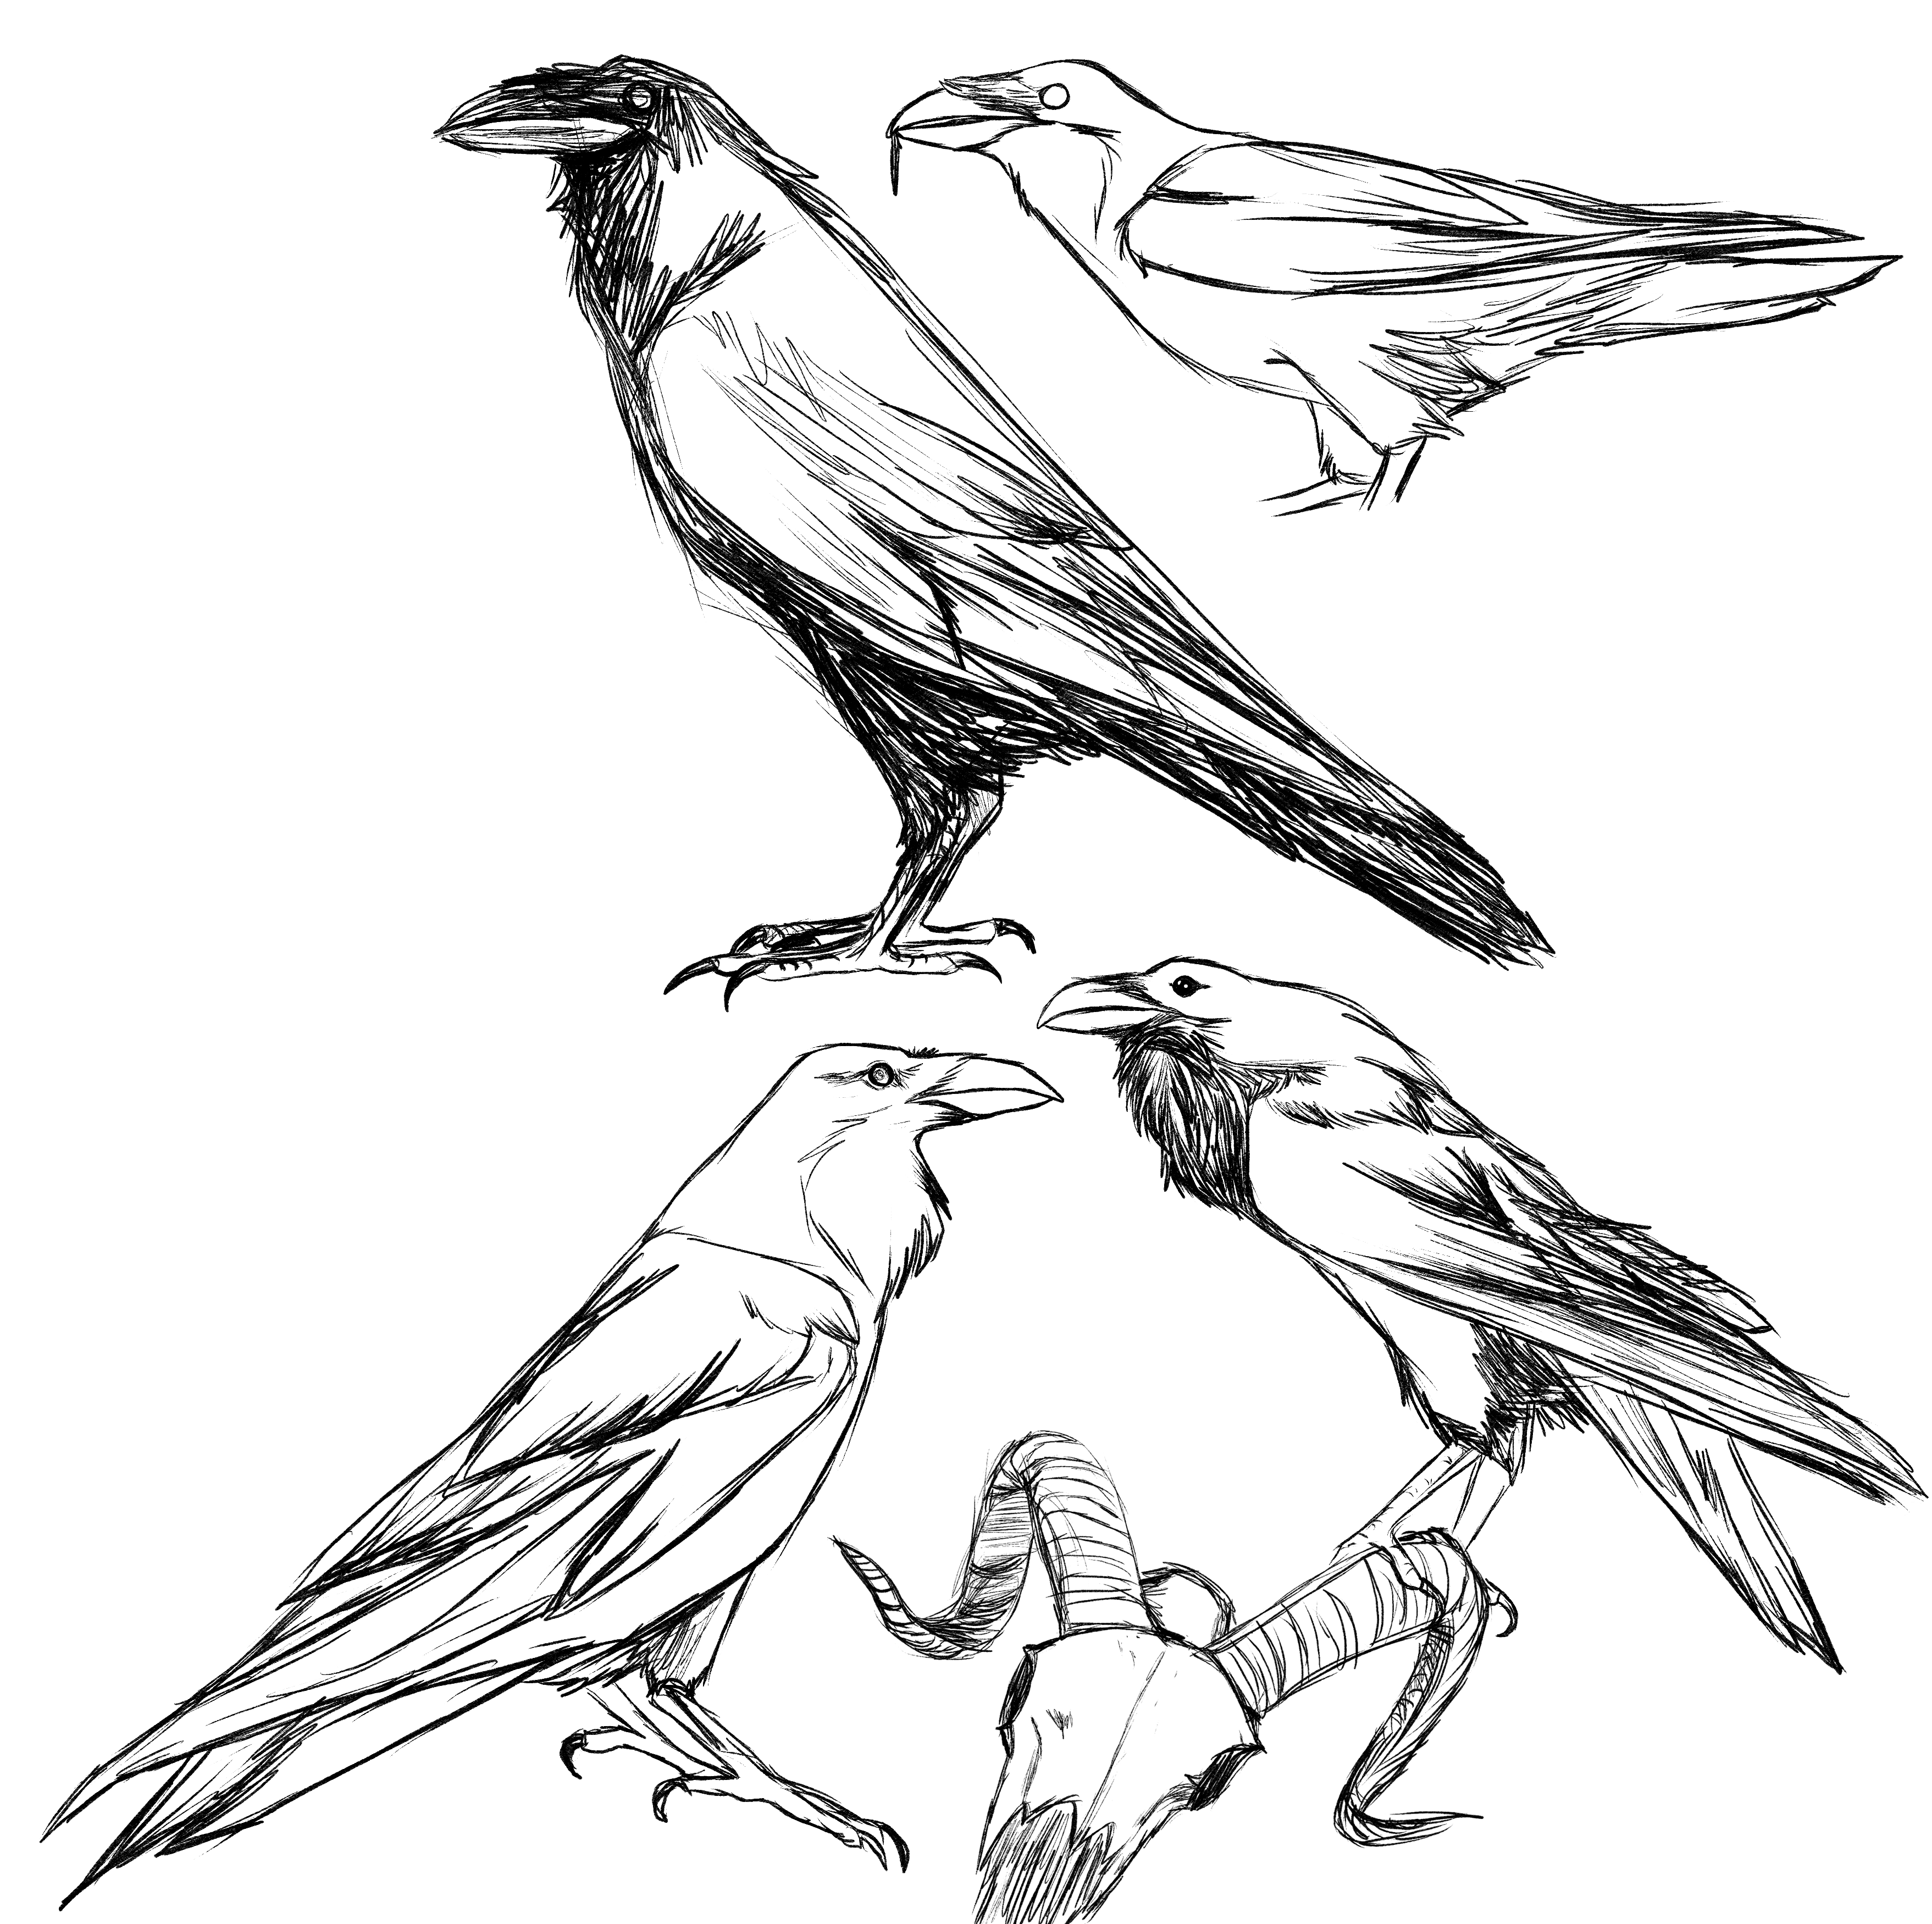 Ravens by CXCR